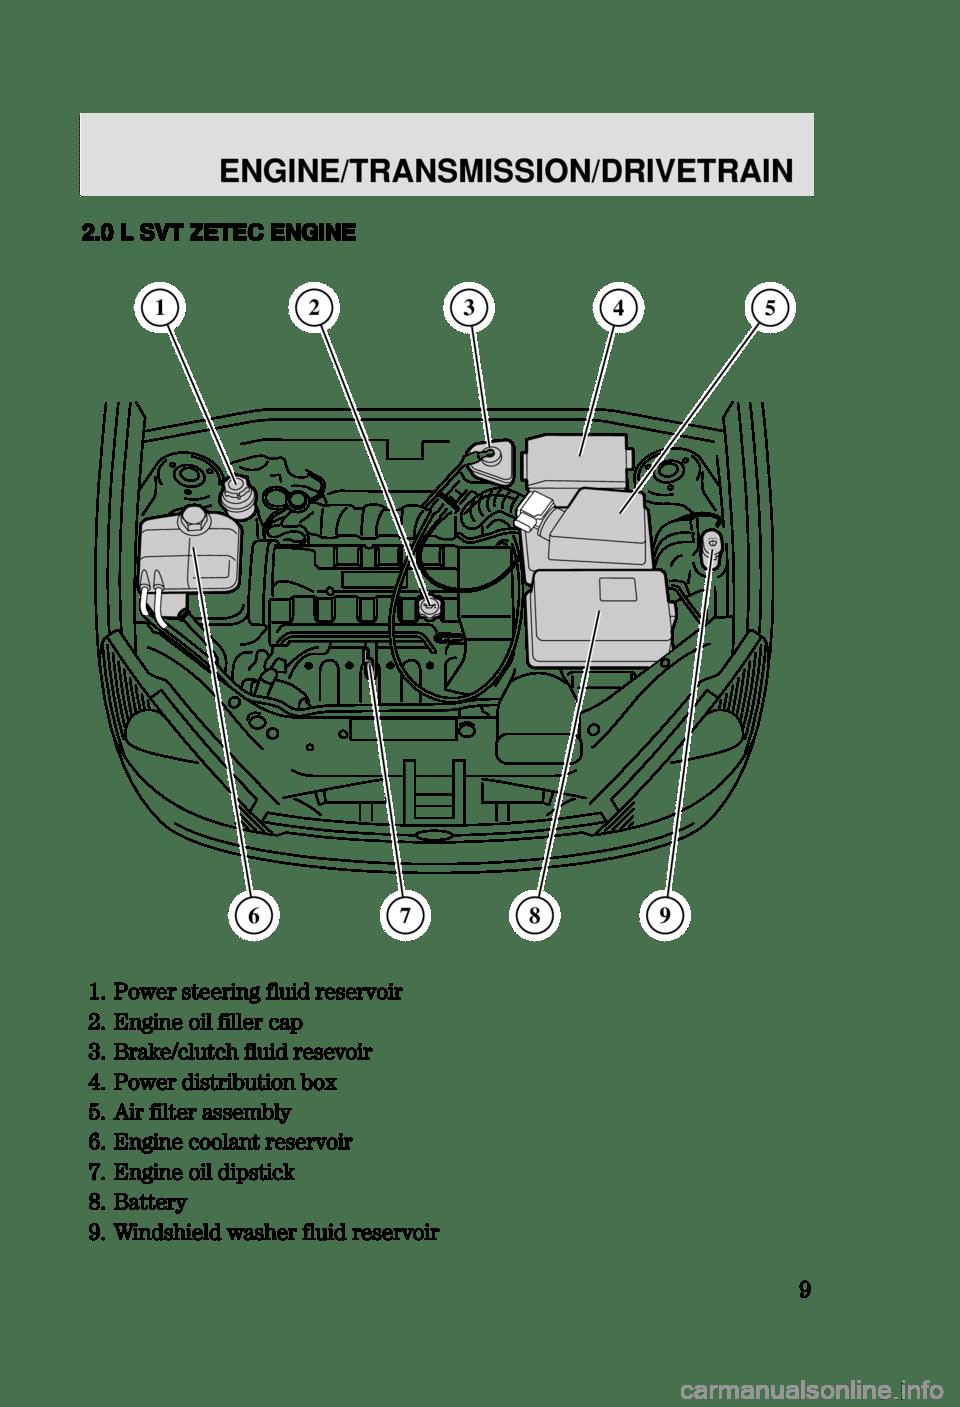 hight resolution of ford focus 2003 1 g svt supplement manual page 9 engine transmission drivetrain 8 2 0 l svt zetec engine